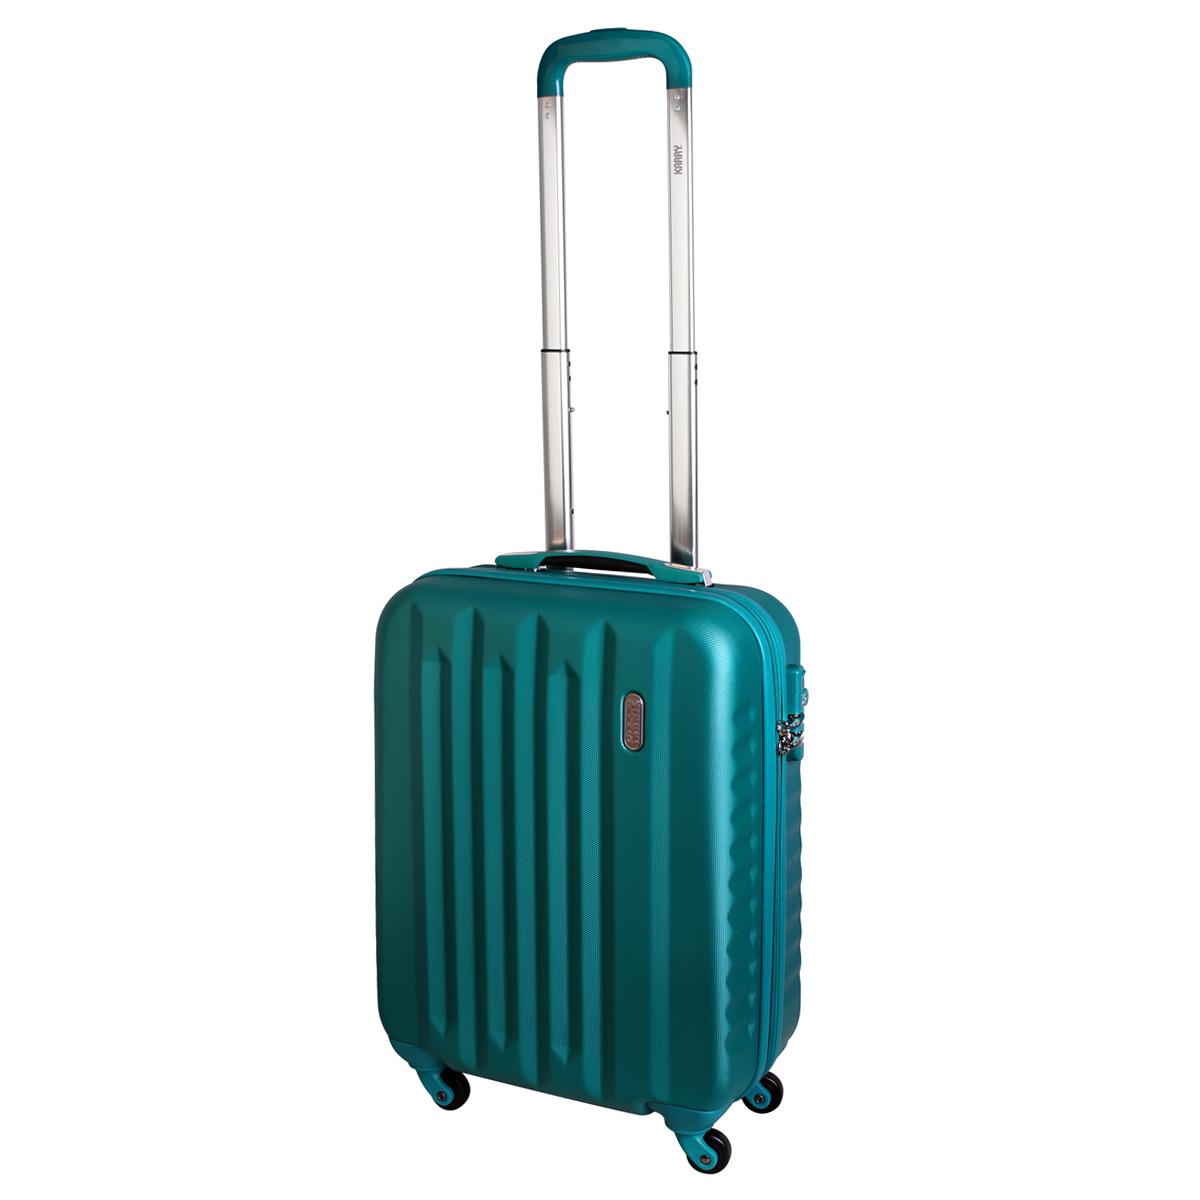 2 tlg hartschalen koffer set trolley handgep ck tsa. Black Bedroom Furniture Sets. Home Design Ideas